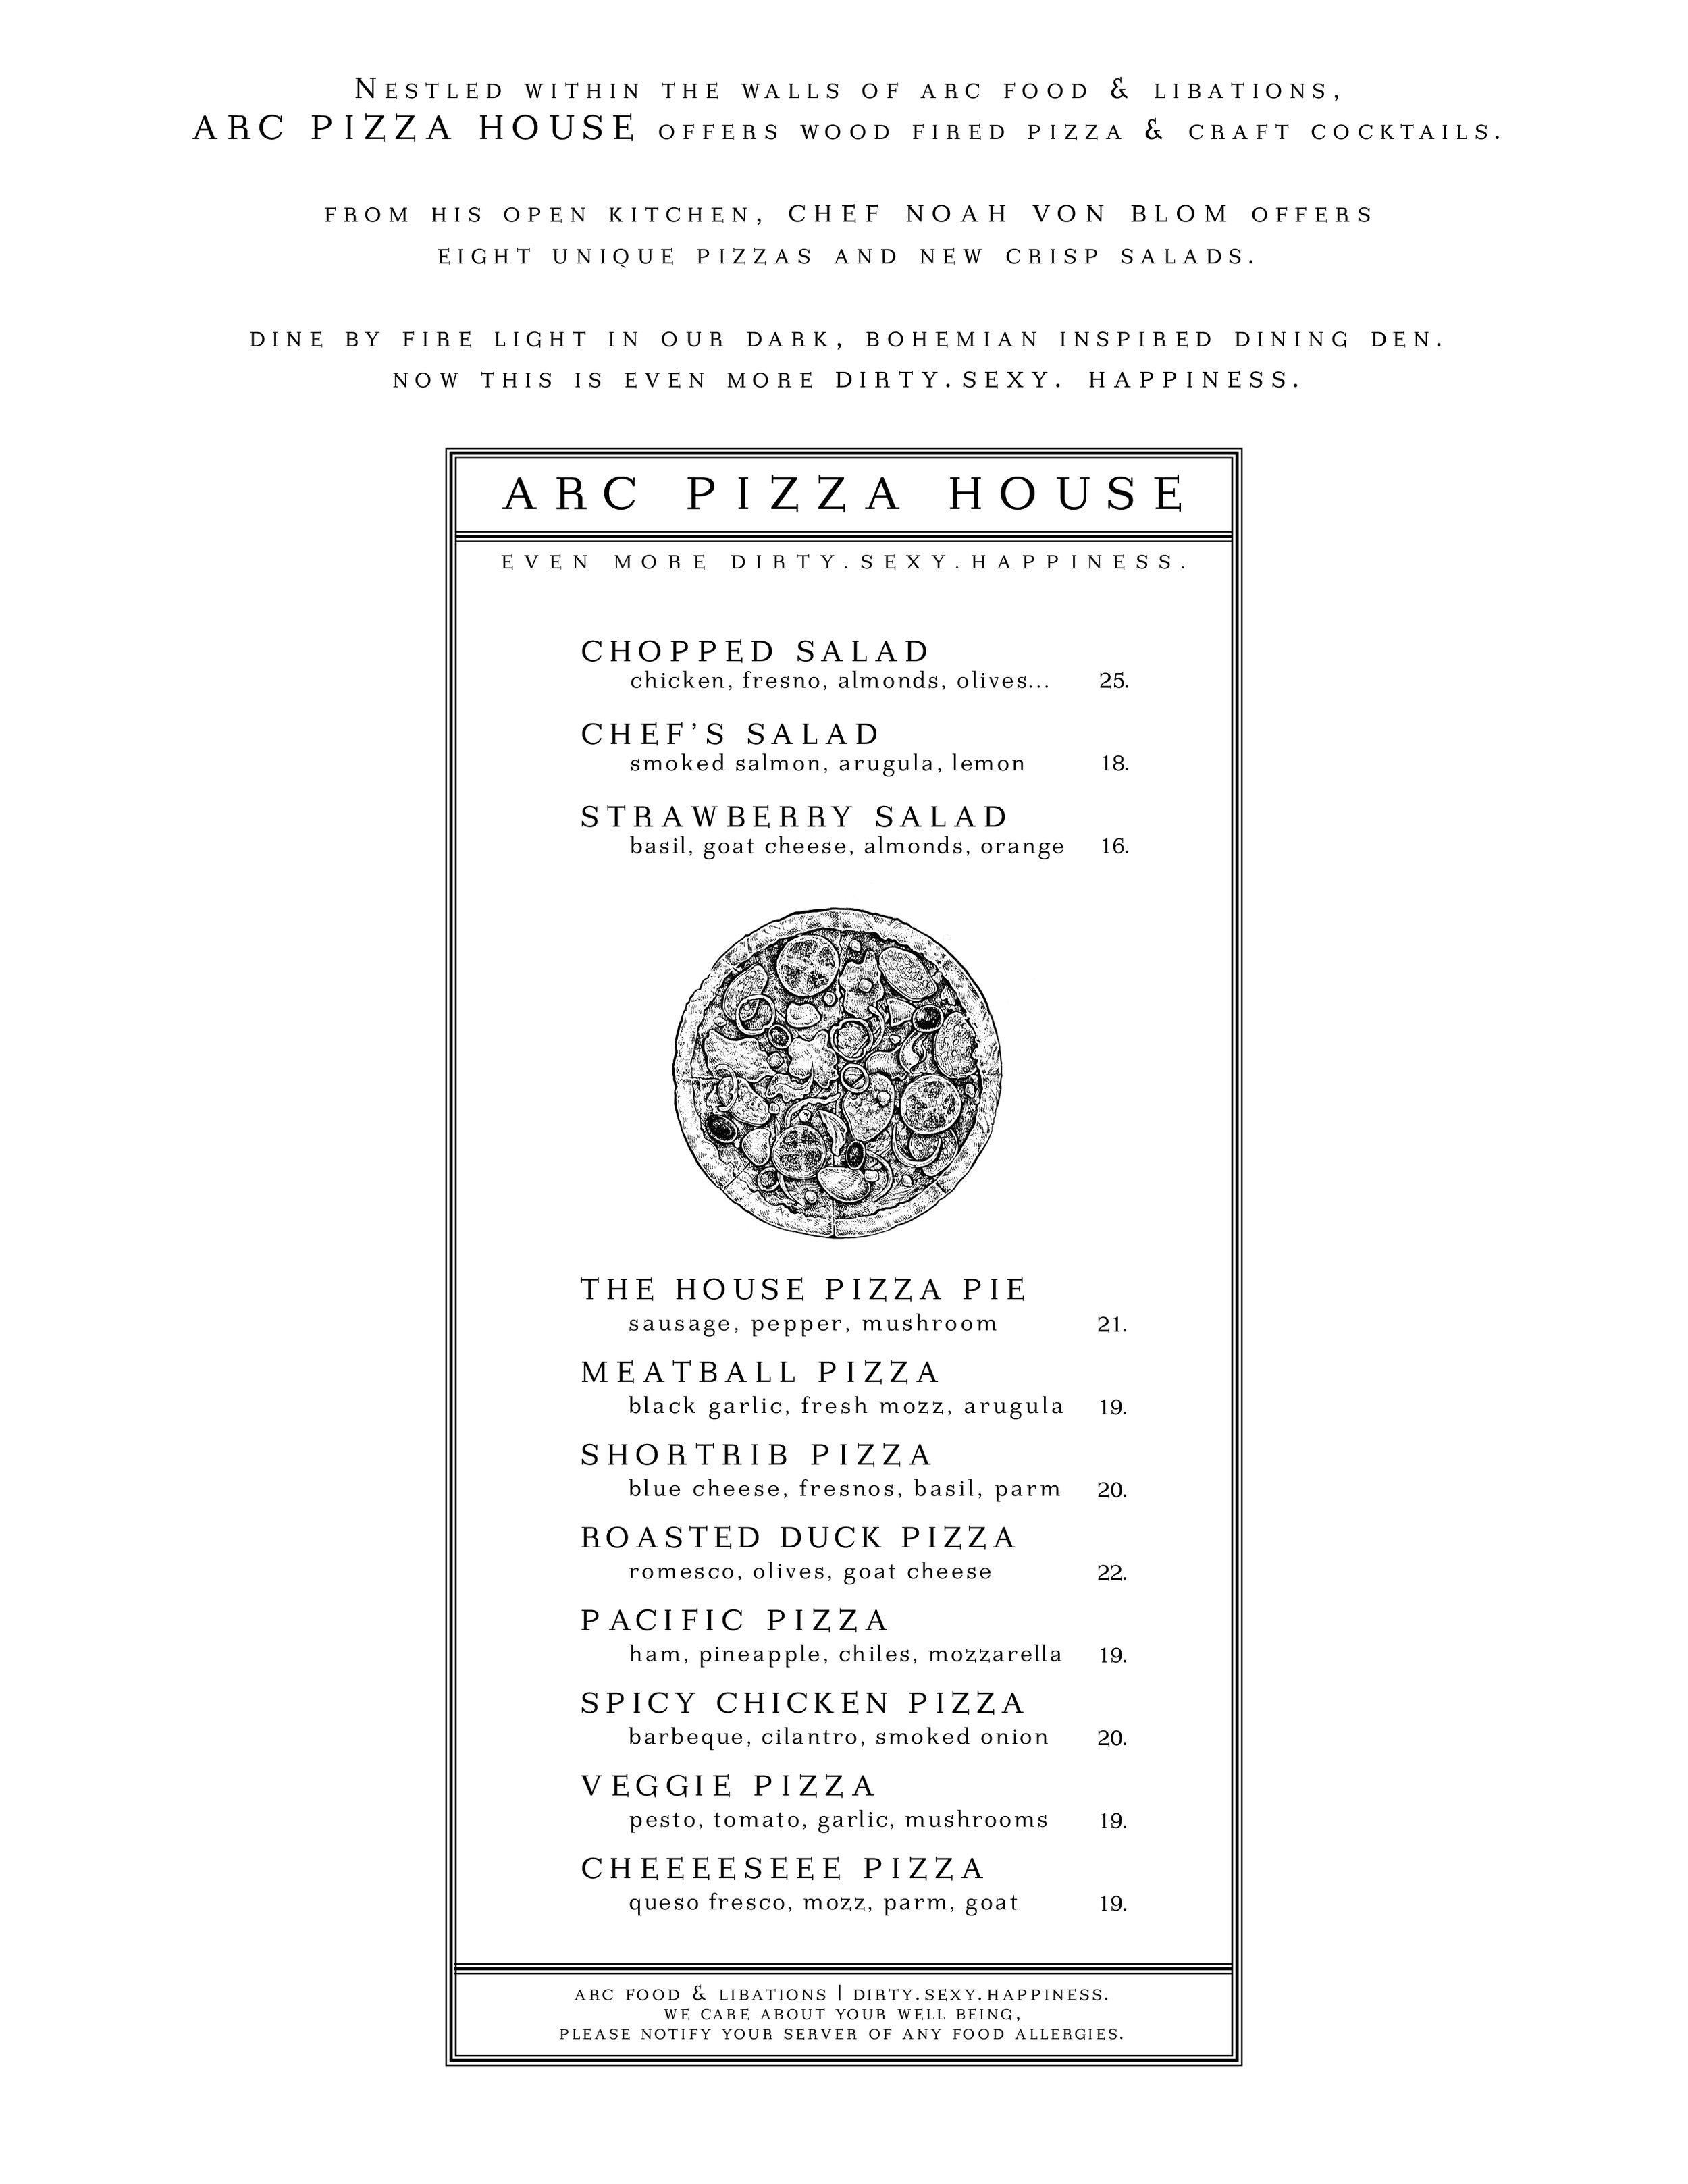 pizza house web copy.jpg